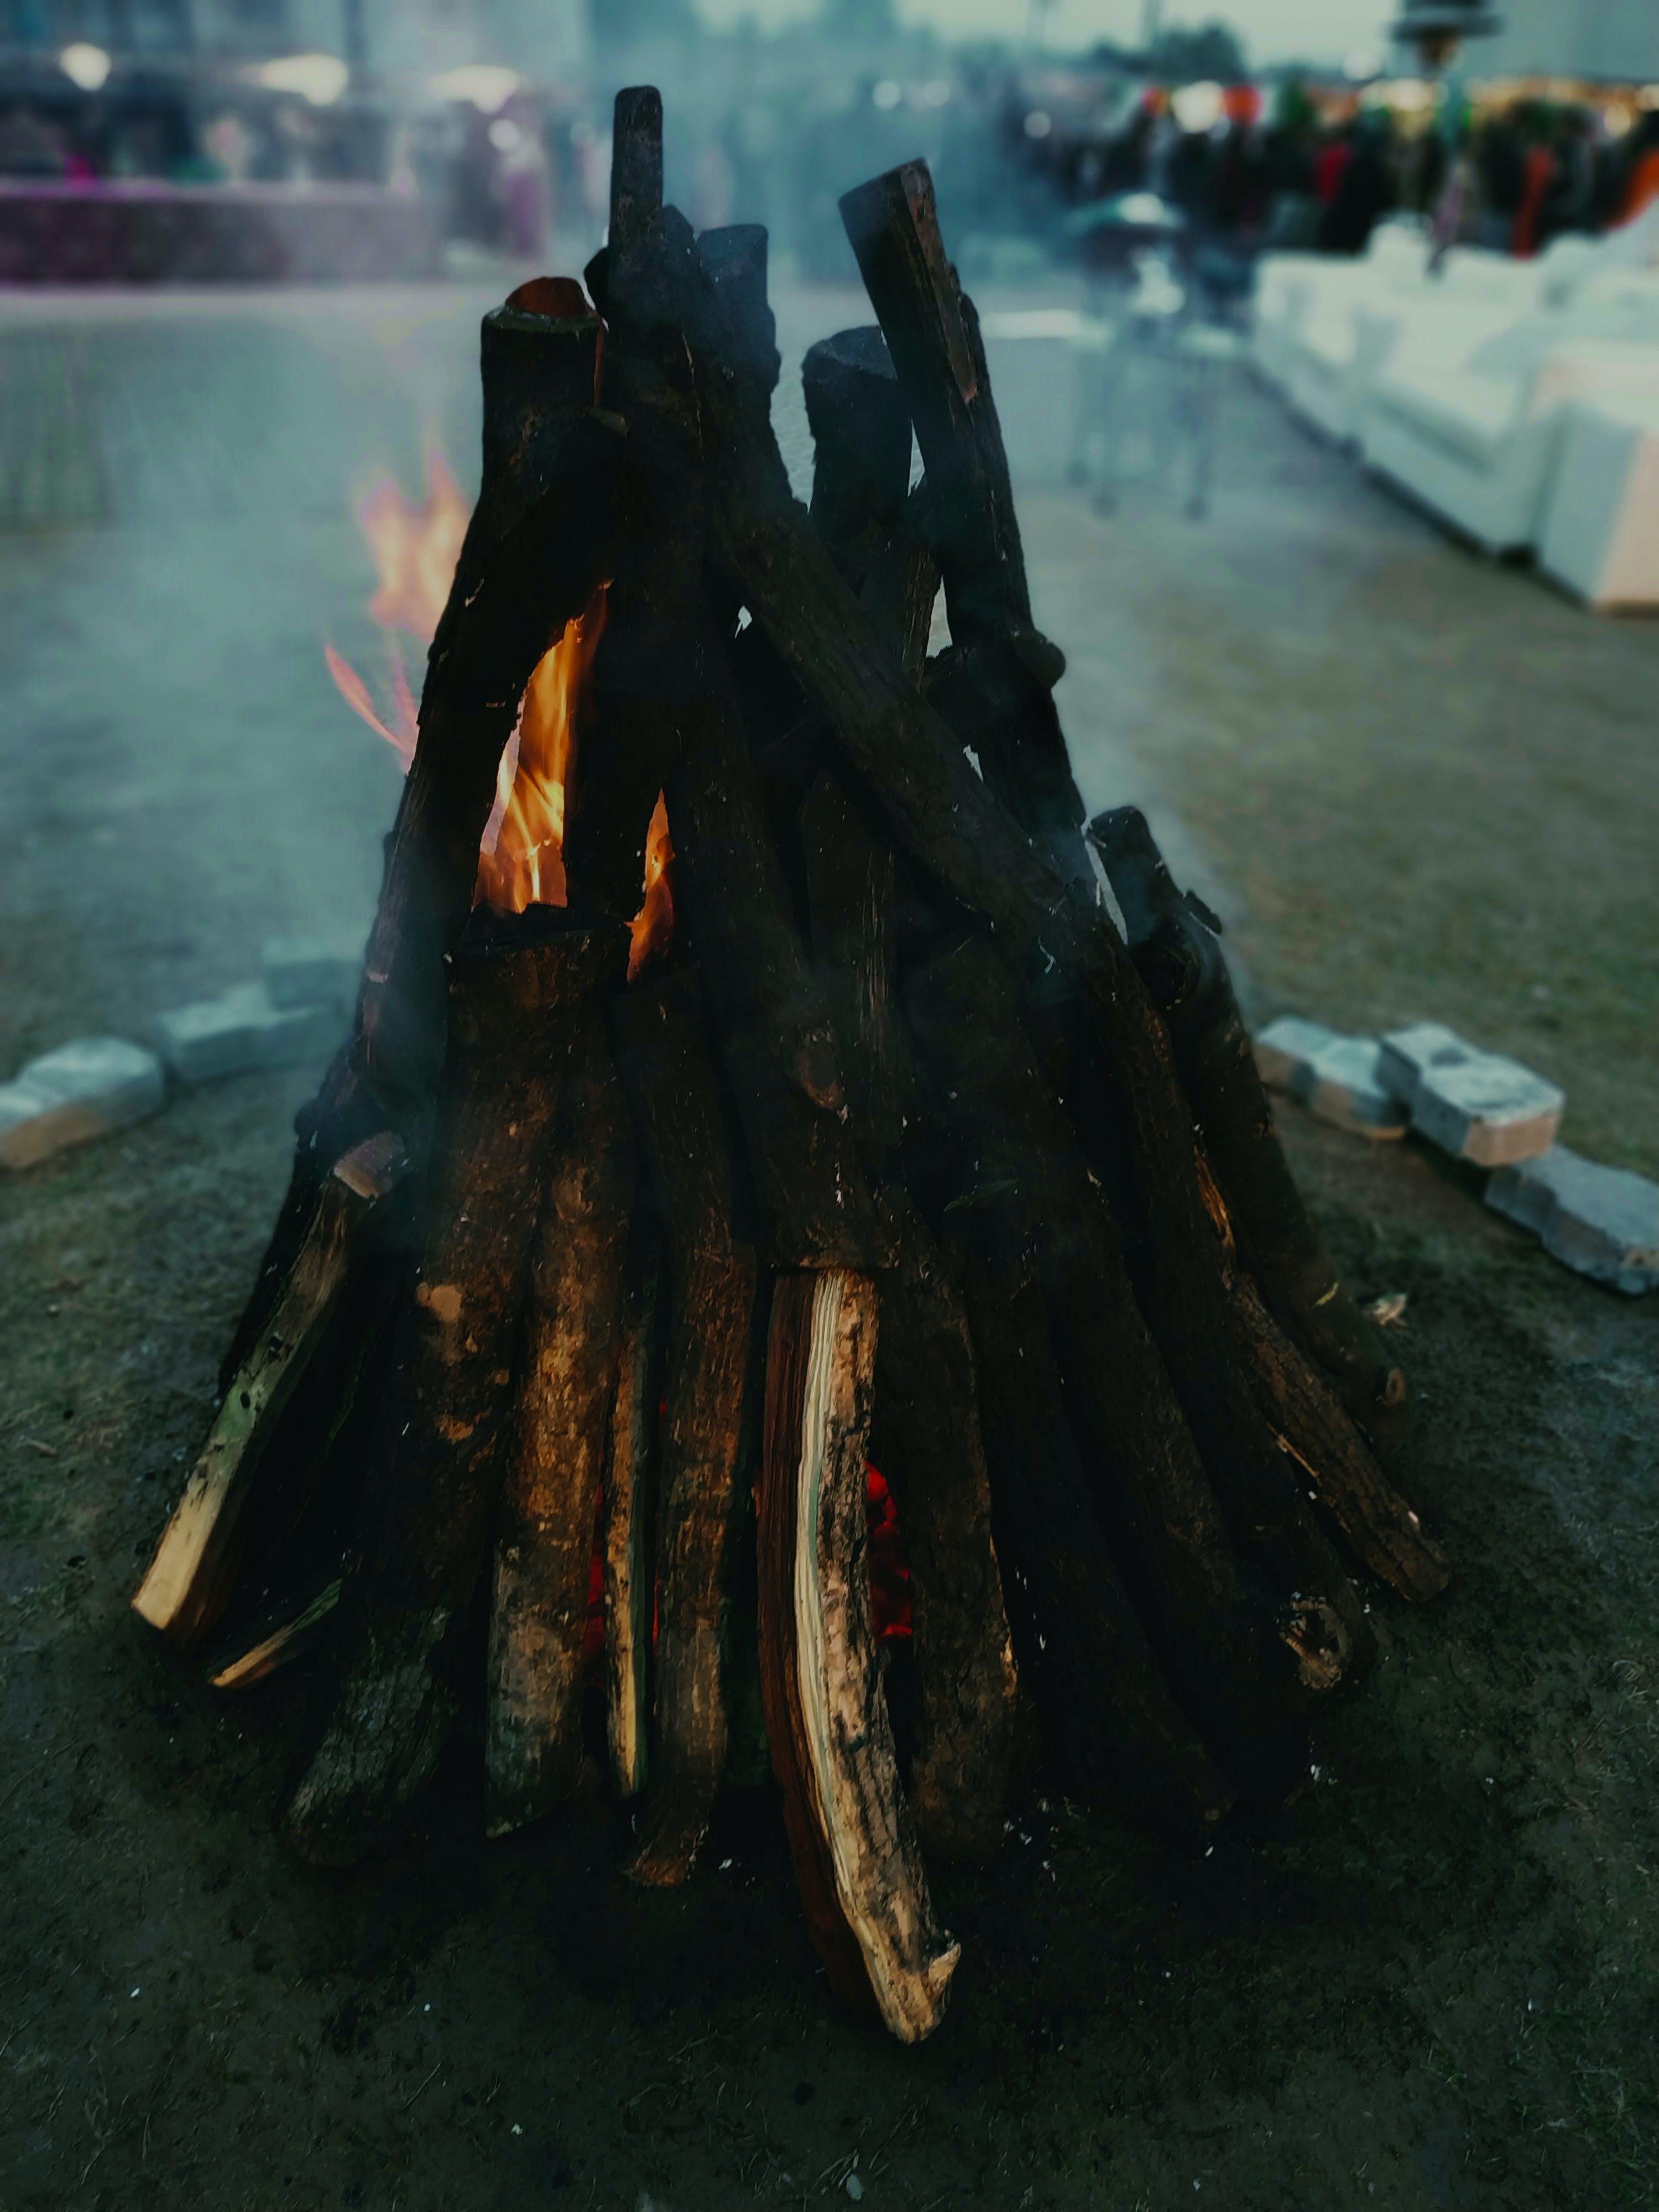 Free stock photo of atmospheric evening, bonfire, dark, vertical